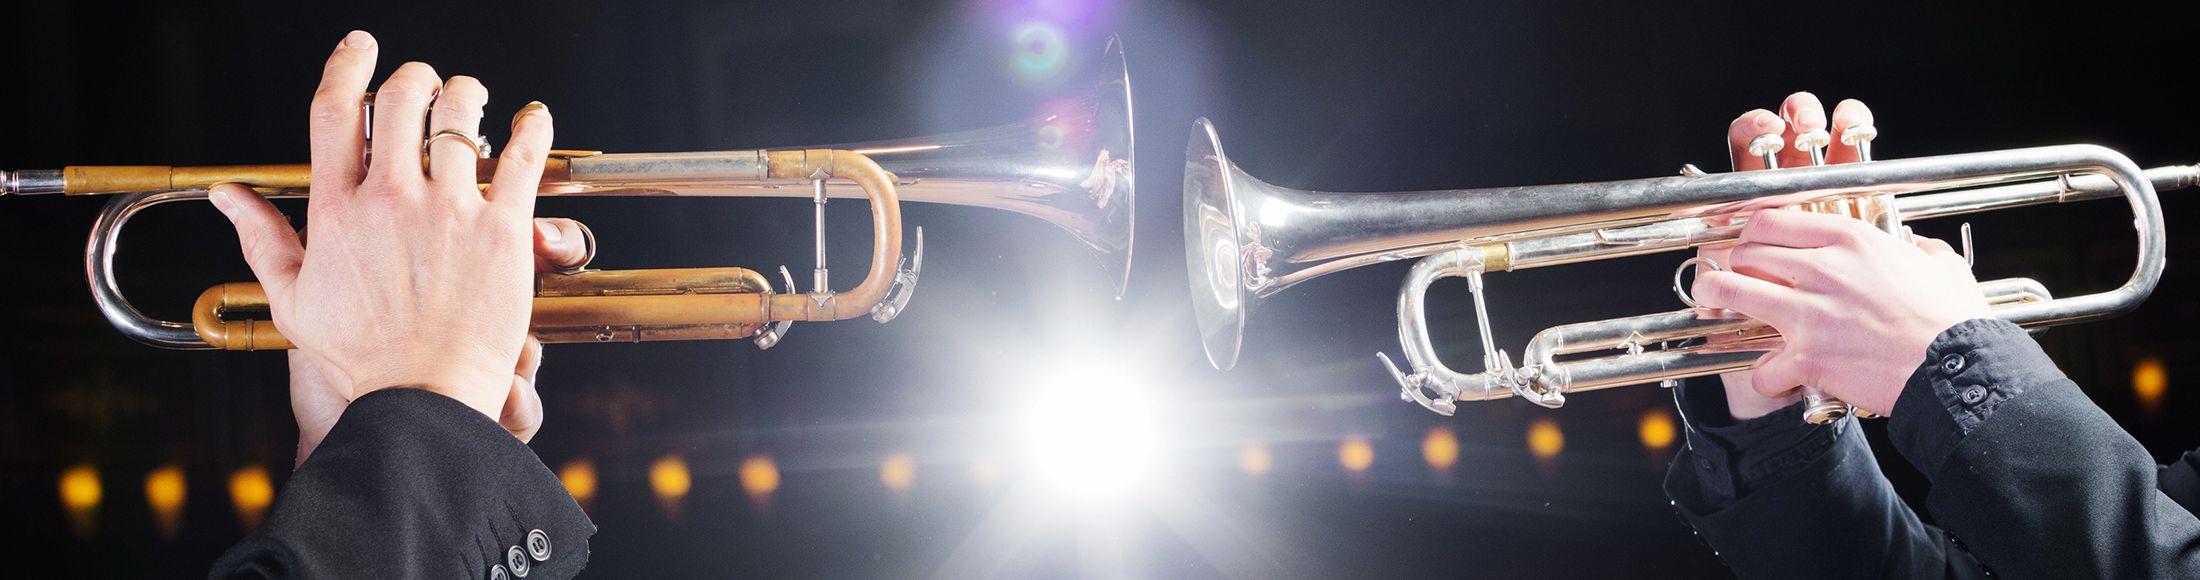 Raise your Jazz Hands